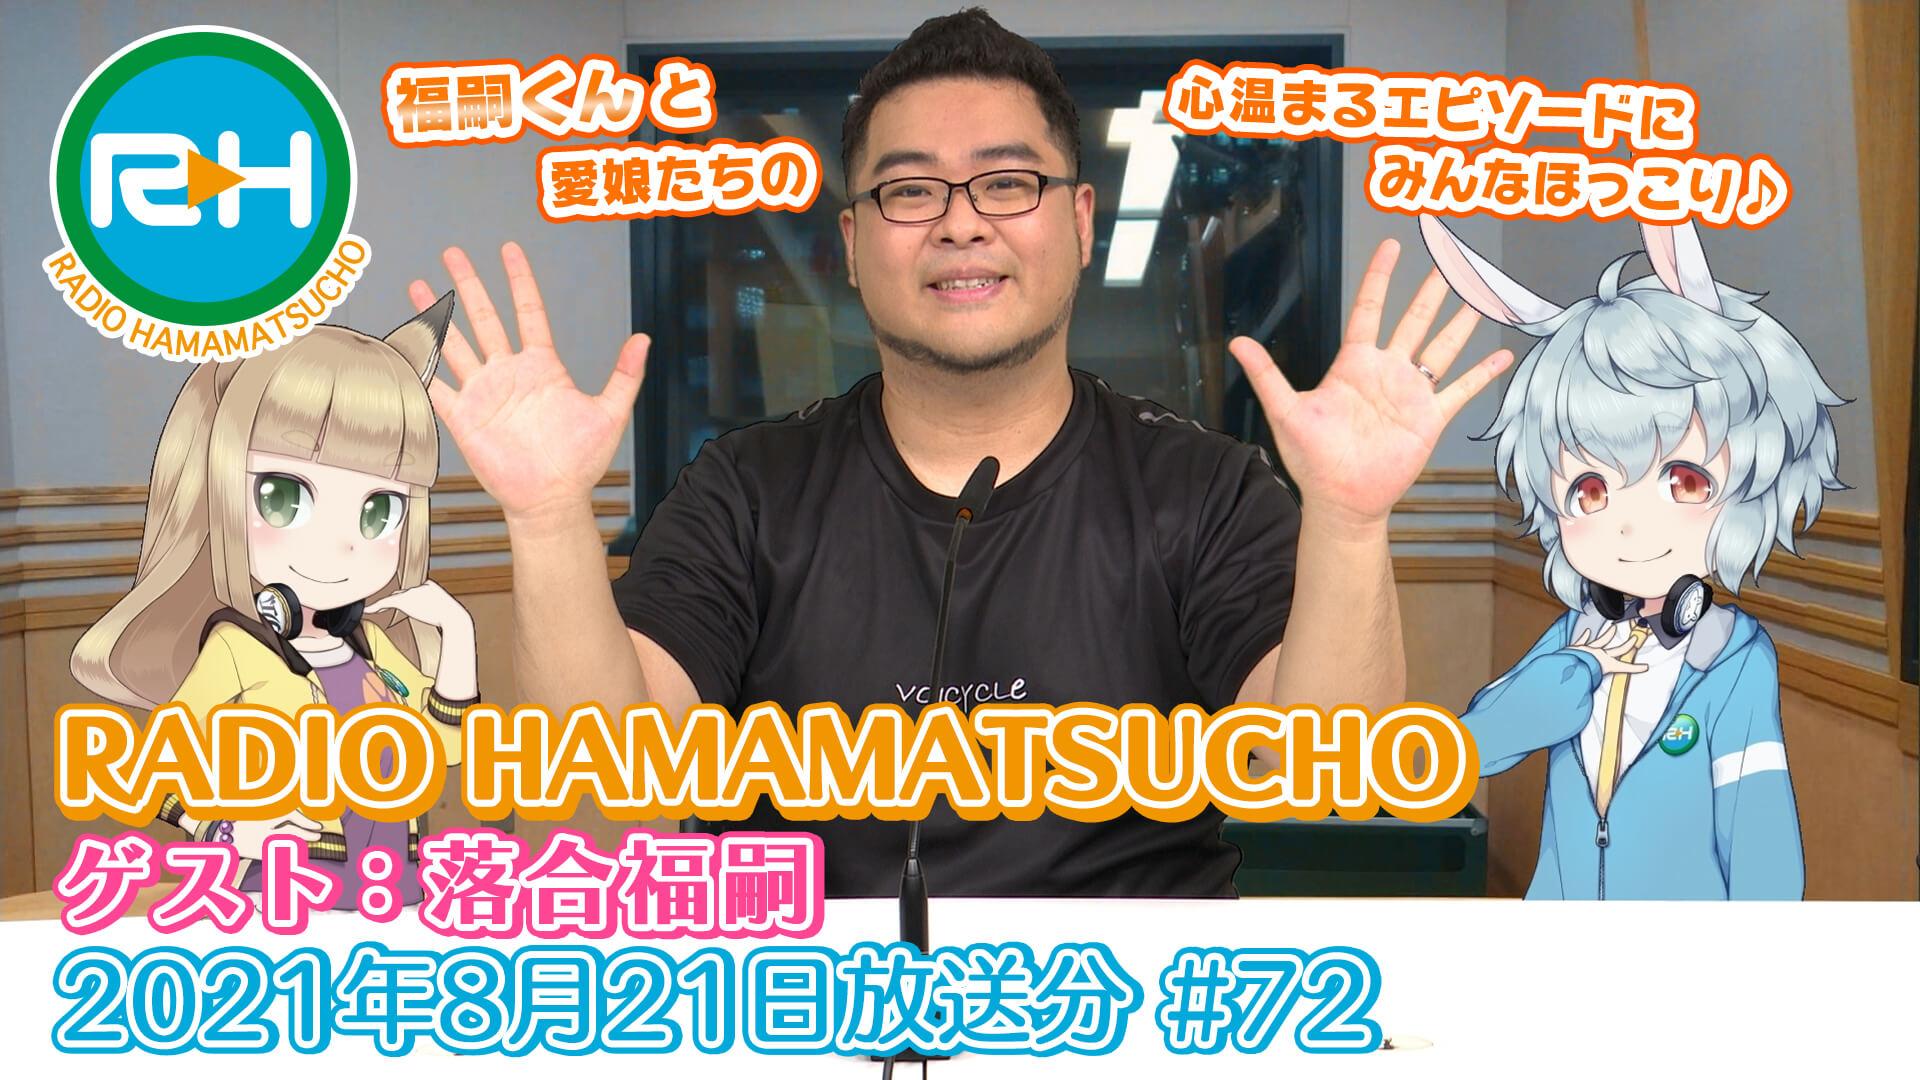 RADIO HAMAMATSUCHO 第72回 (2021年8月21日放送分) ゲスト:  落合福嗣